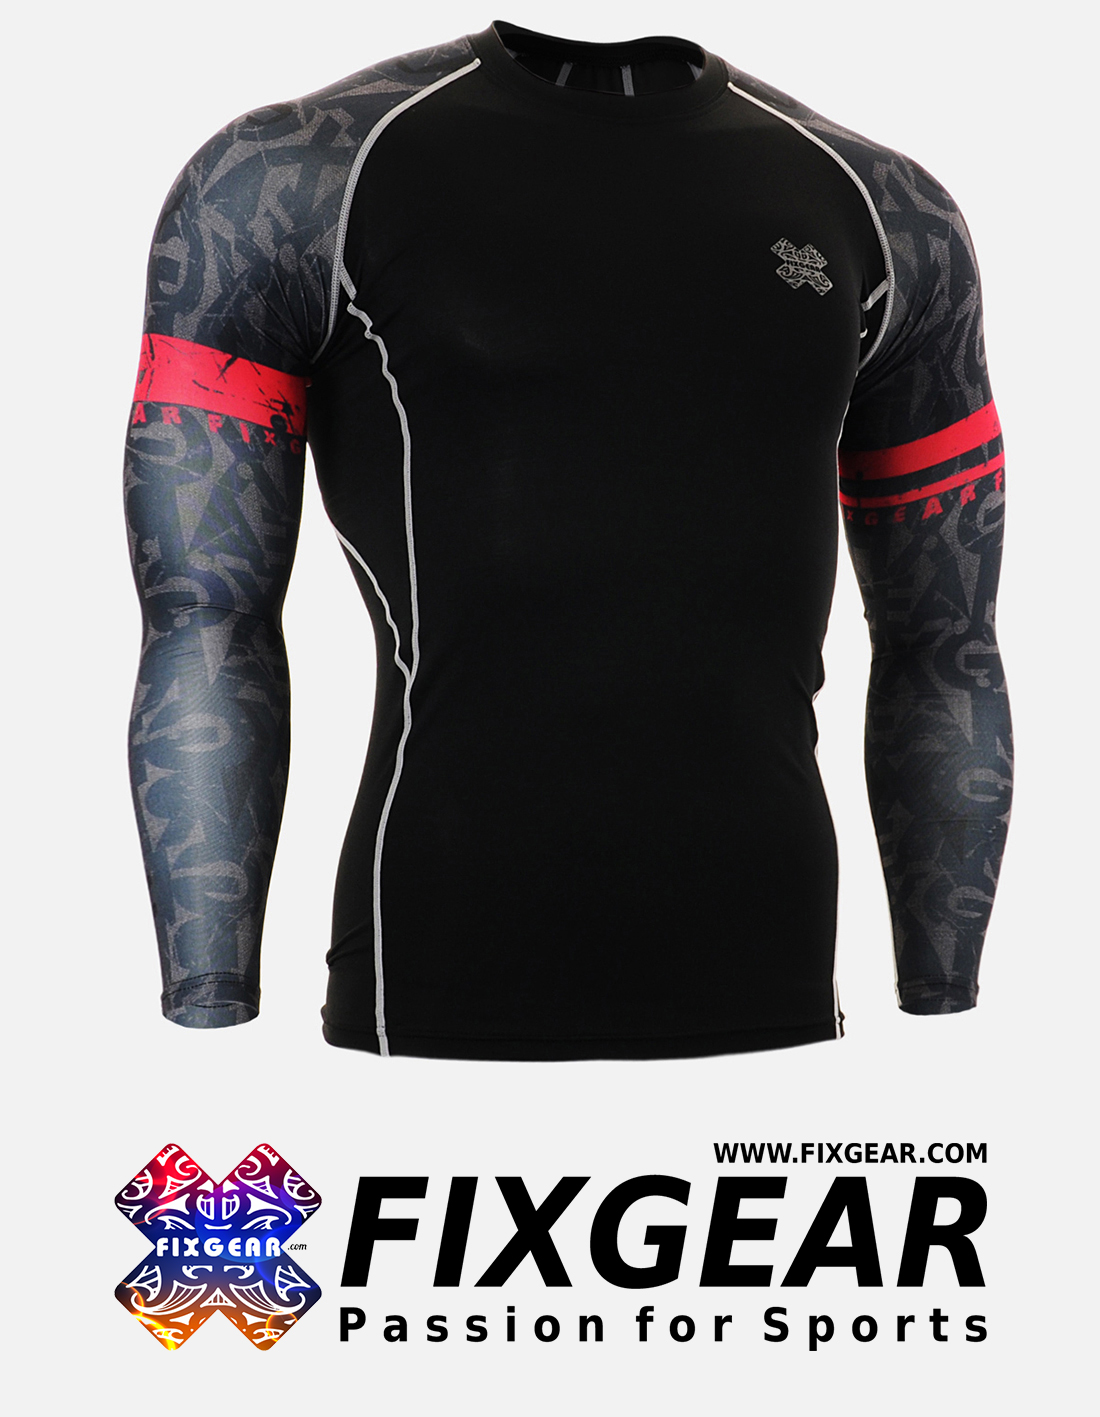 FIXGEAR CPD-BG6 Compression Base Layer Shirt